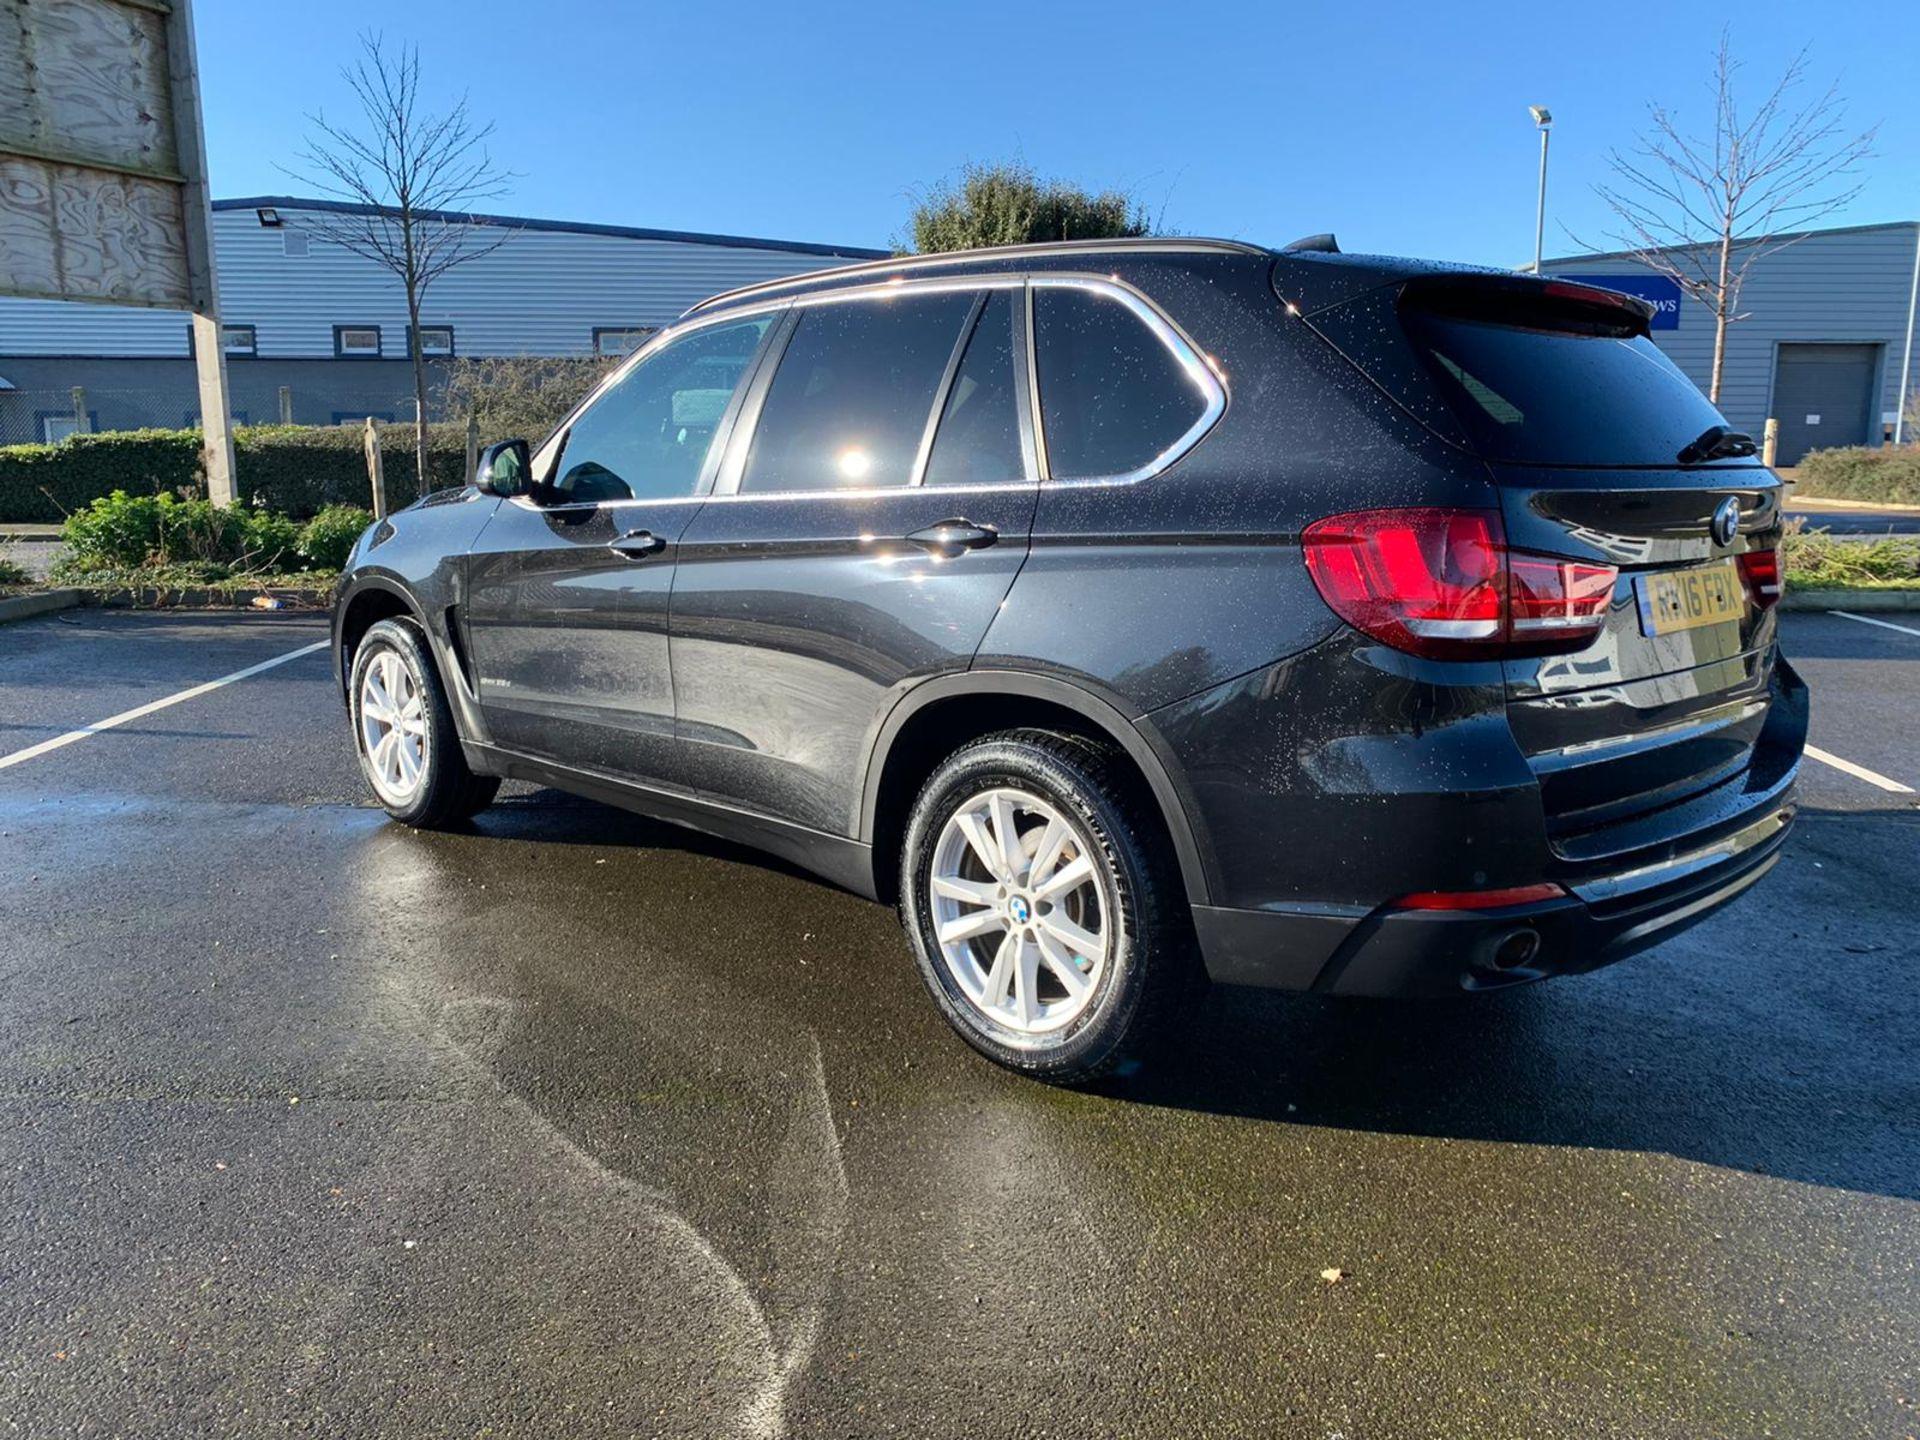 "(Reserve Met) BMW X5 2.0d S-DRIVE ""Special Equipment"" Auto- 7 Seater -16 Reg - Sat Nav- (New Shape) - Image 8 of 43"